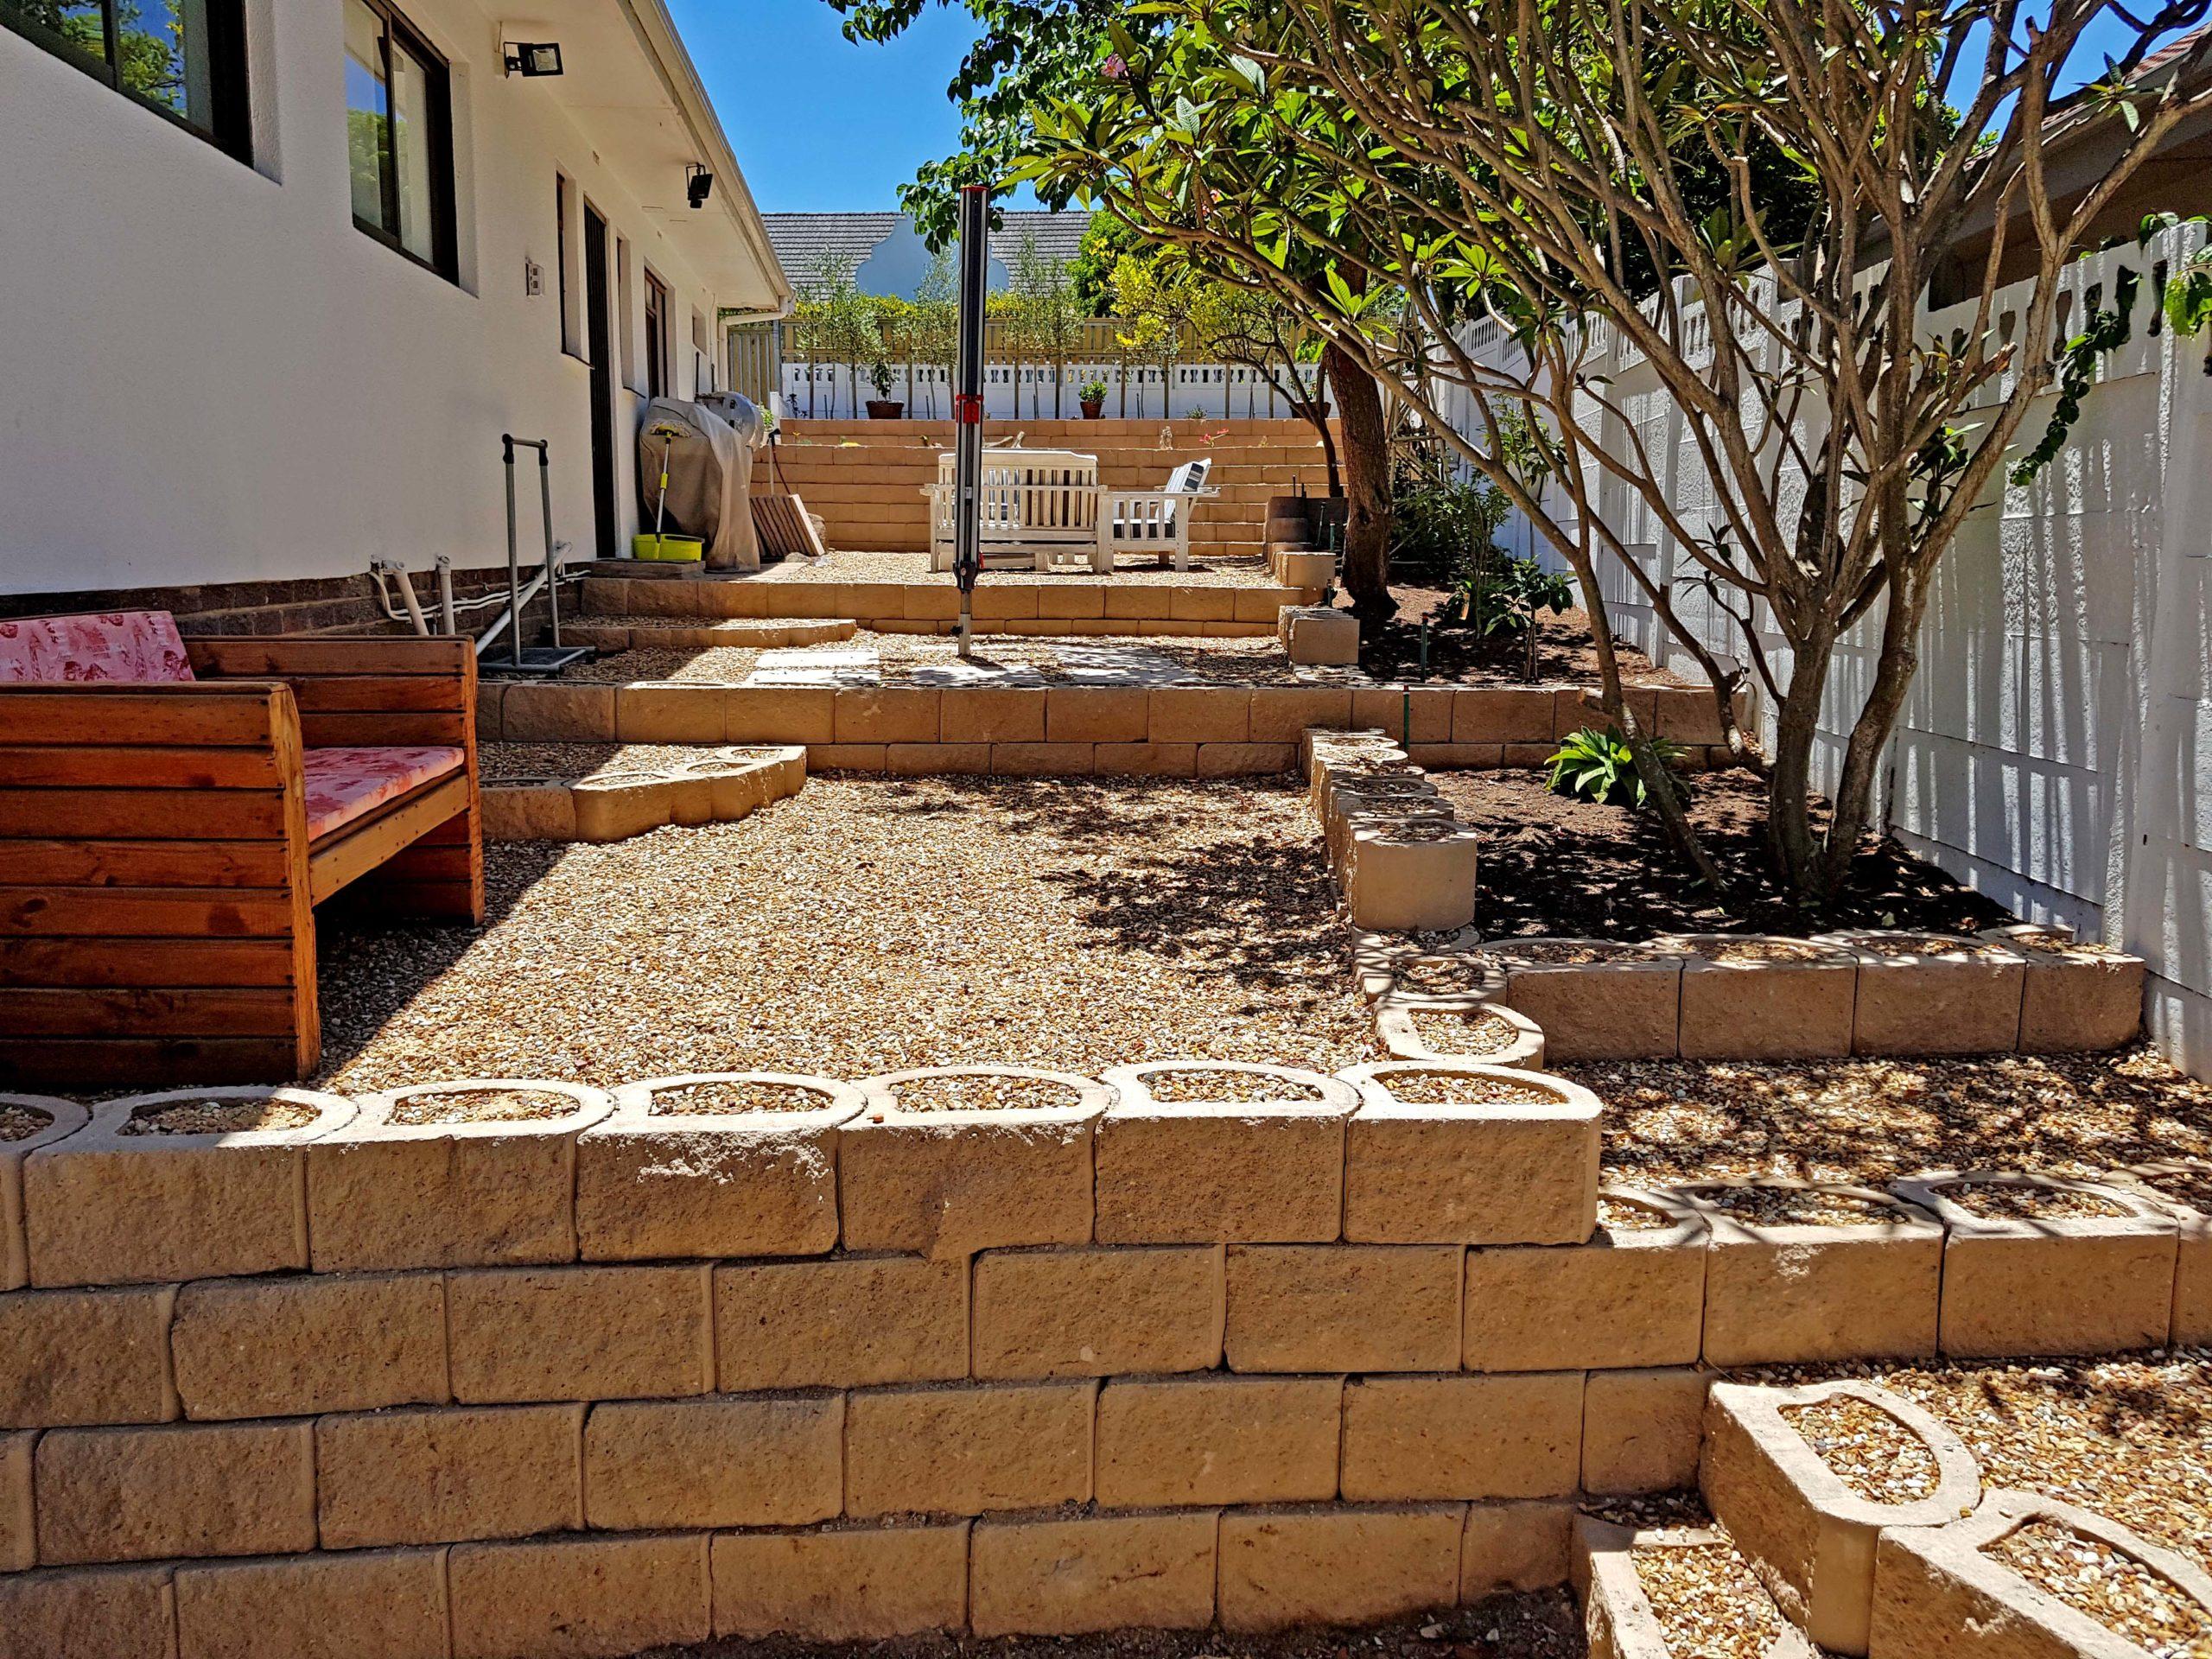 Many terraces for many purposes